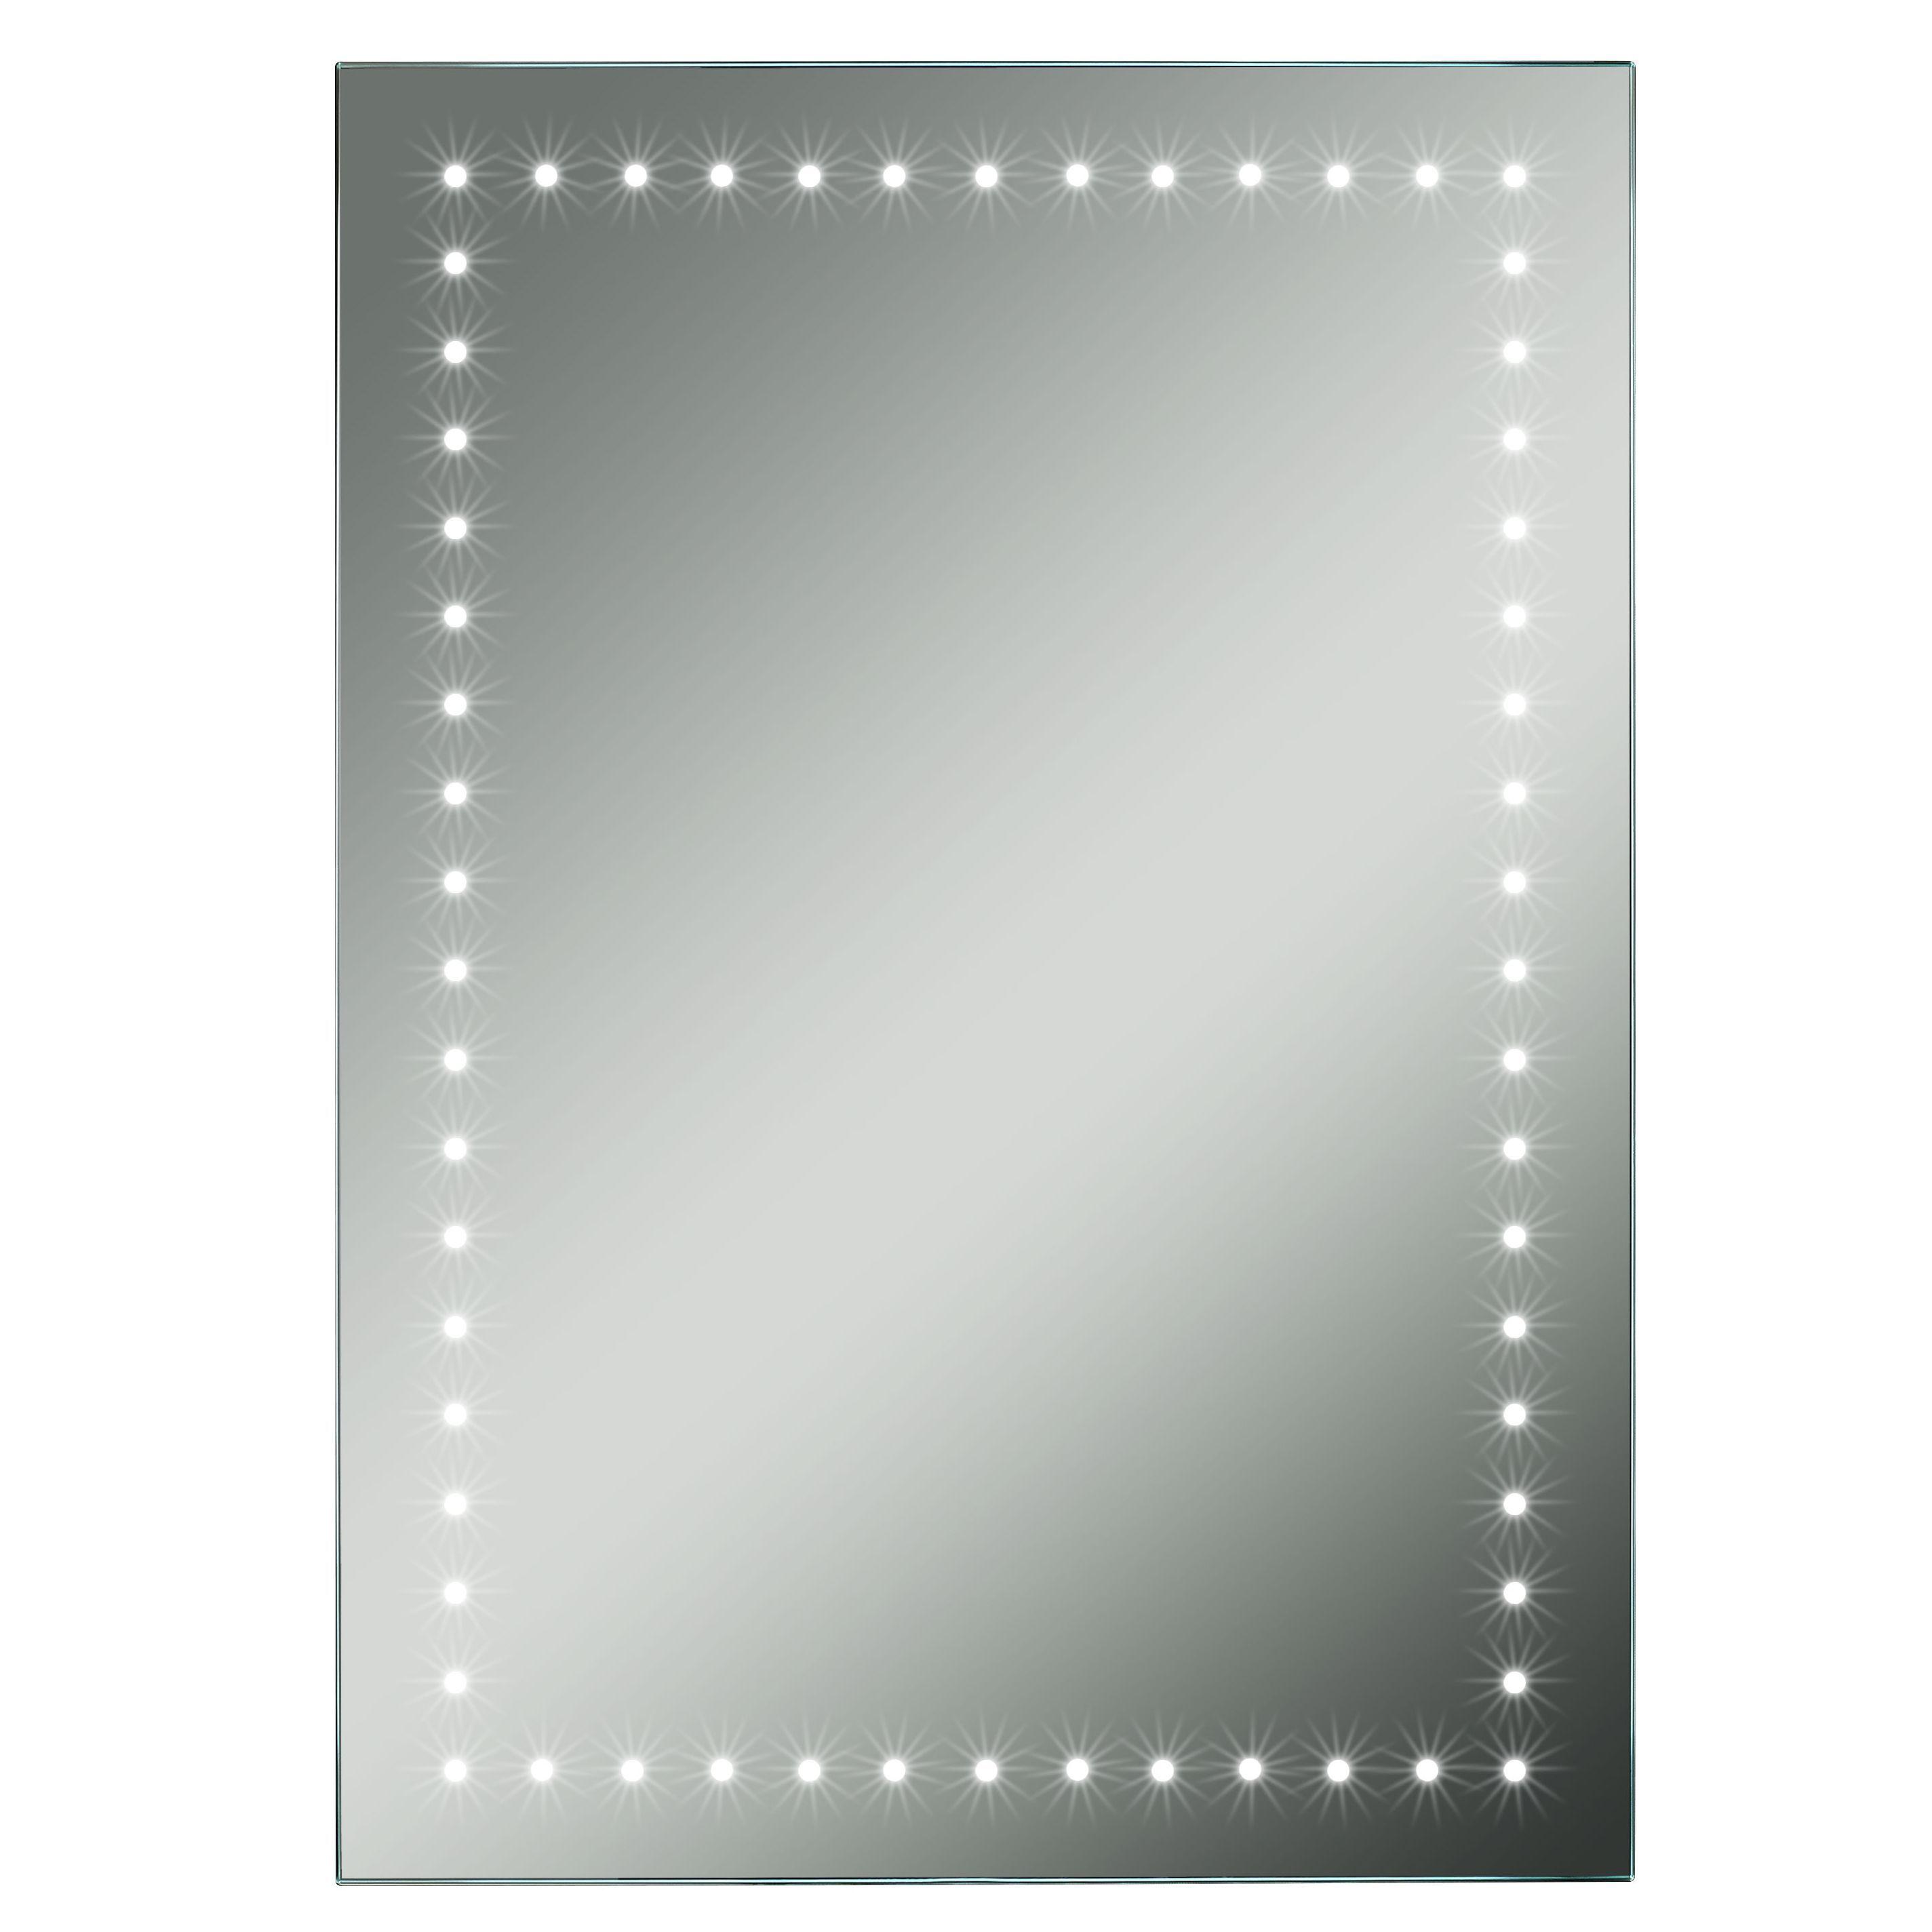 Lumino Forza Illuminated Bathroom Rectangular Mirror With Bluetooth Speakers (w)500mm (h)700mm